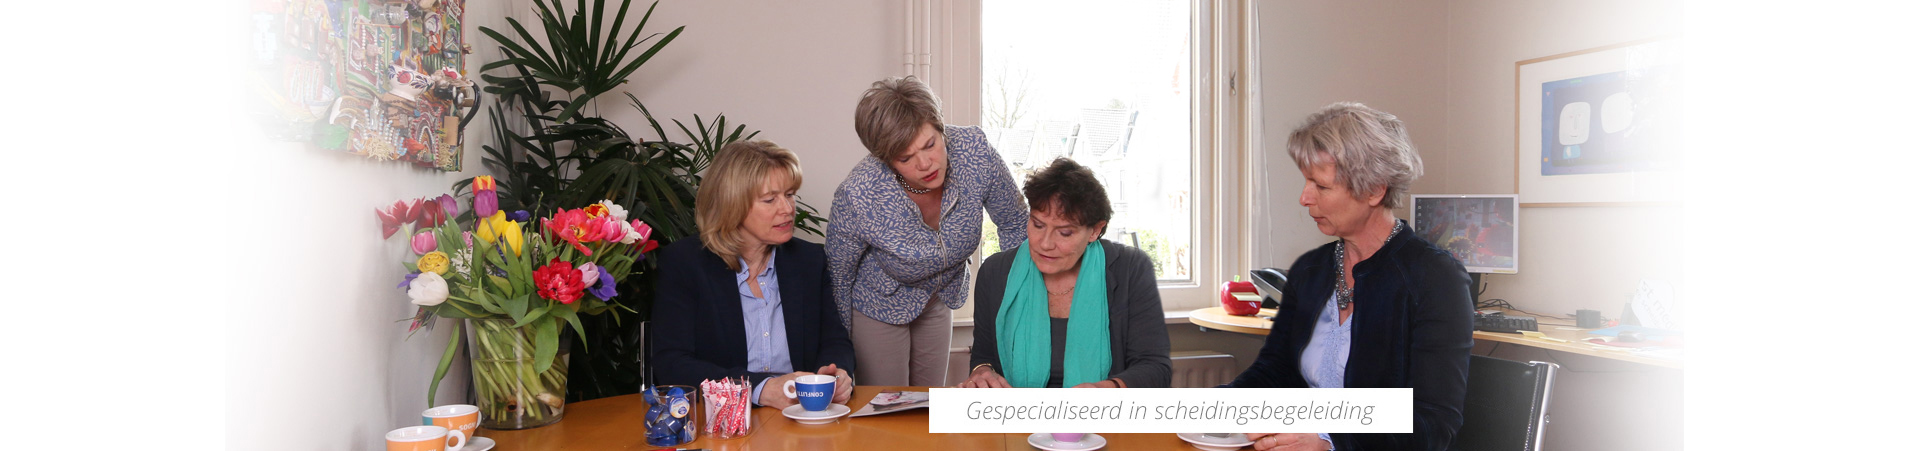 https://dehorstadvocaten.nl/wp-content/uploads/2017/02/Scheidingsadvocaten-Amersfoort.jpg